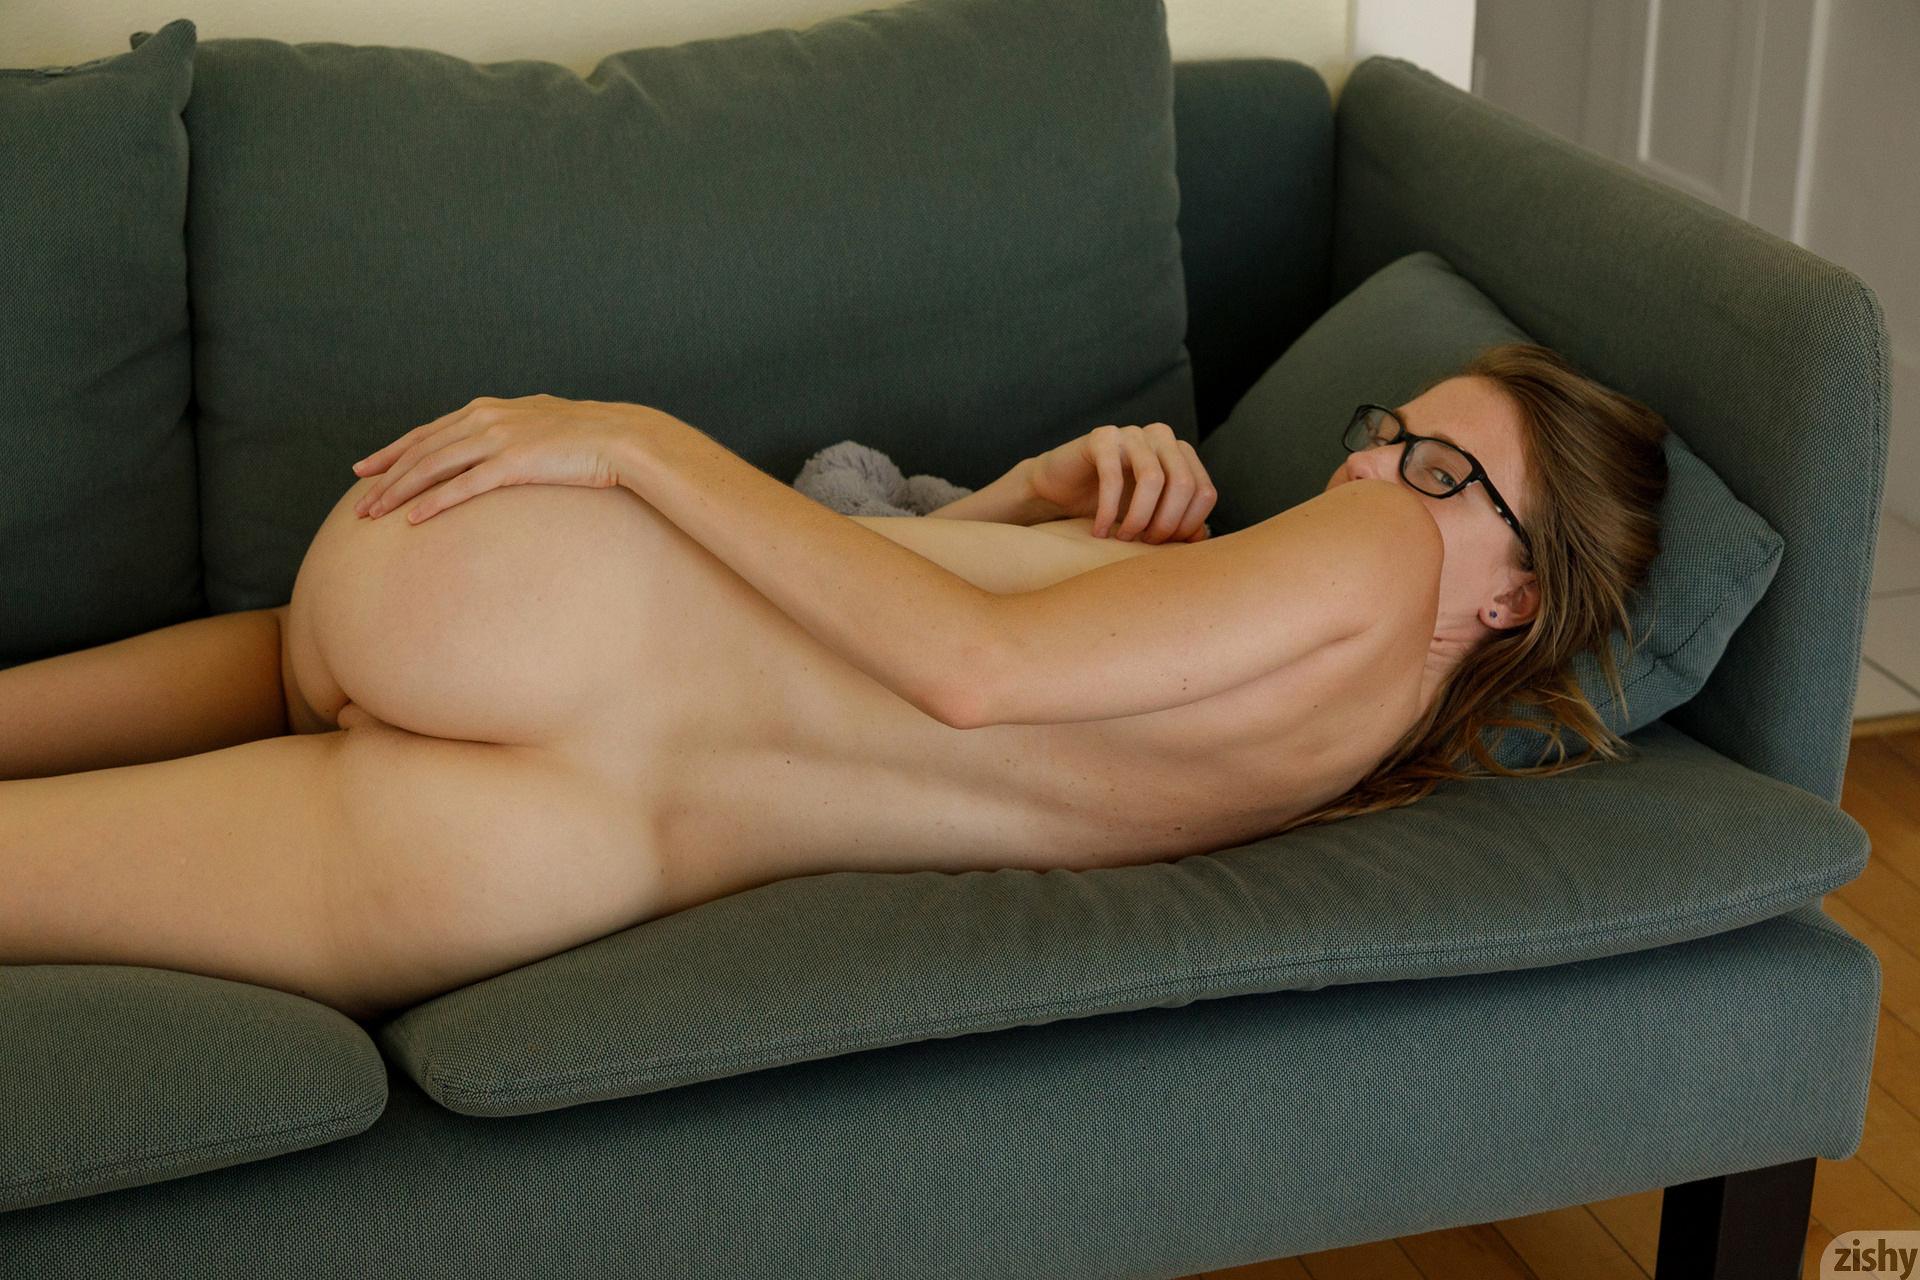 Ashley Lane Everyday People Zishy (37)